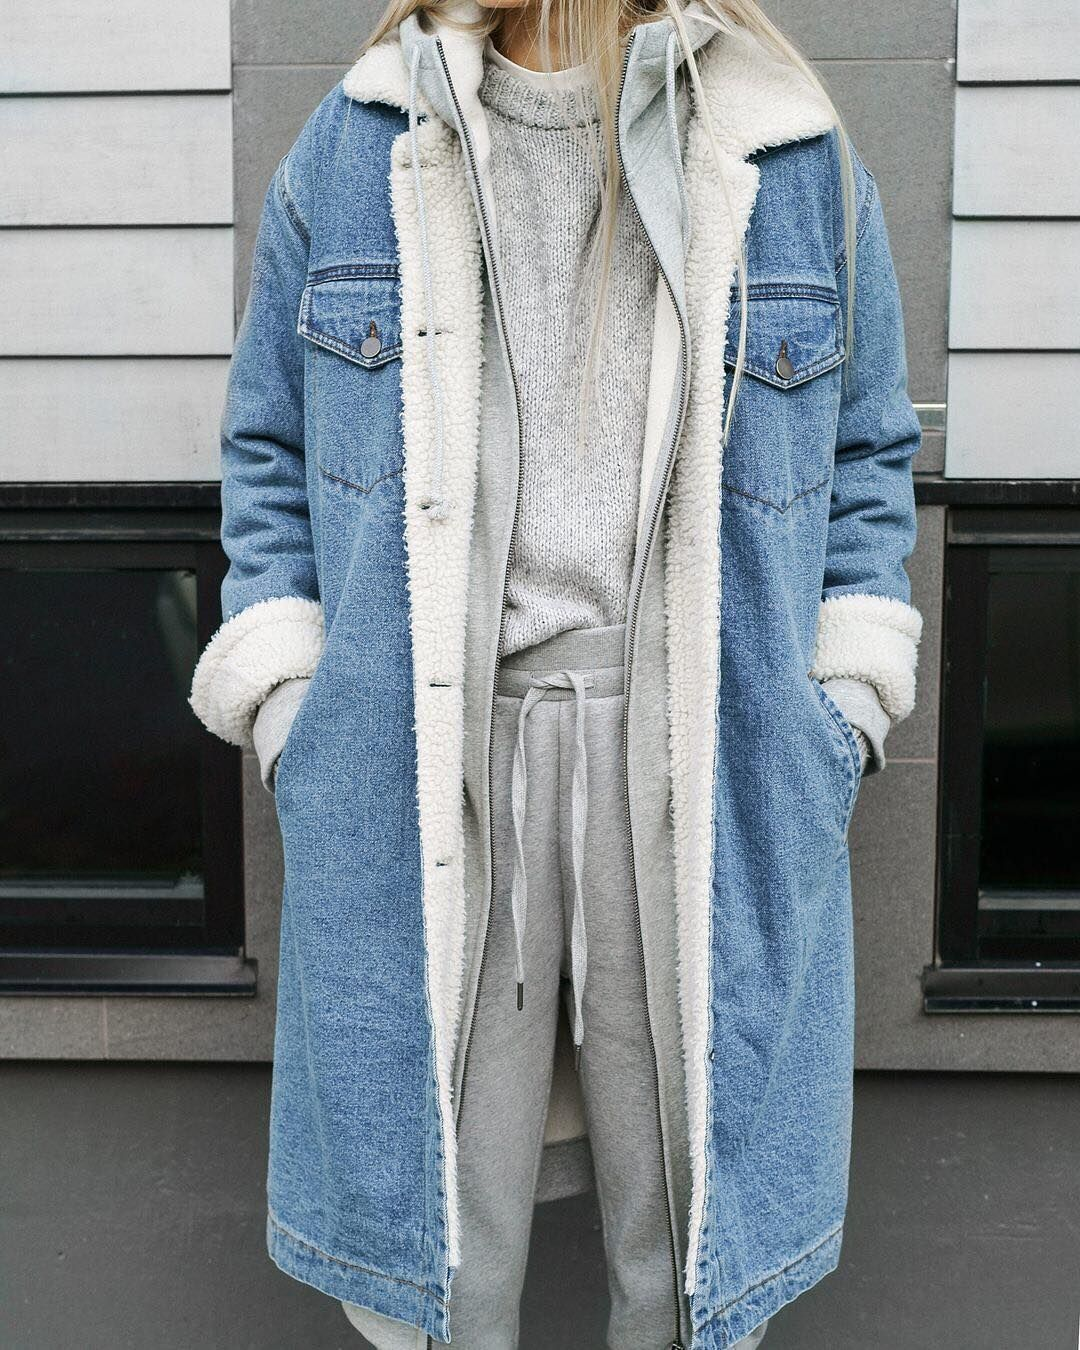 9 766 Kedveles 100 Hozzaszolas Oak Fort Oakandfort Instagram Hozzaszolasa Everyday Look Beoakandfort Sherp Denim Outerwear Fashion Long Denim Jacket [ 1350 x 1080 Pixel ]